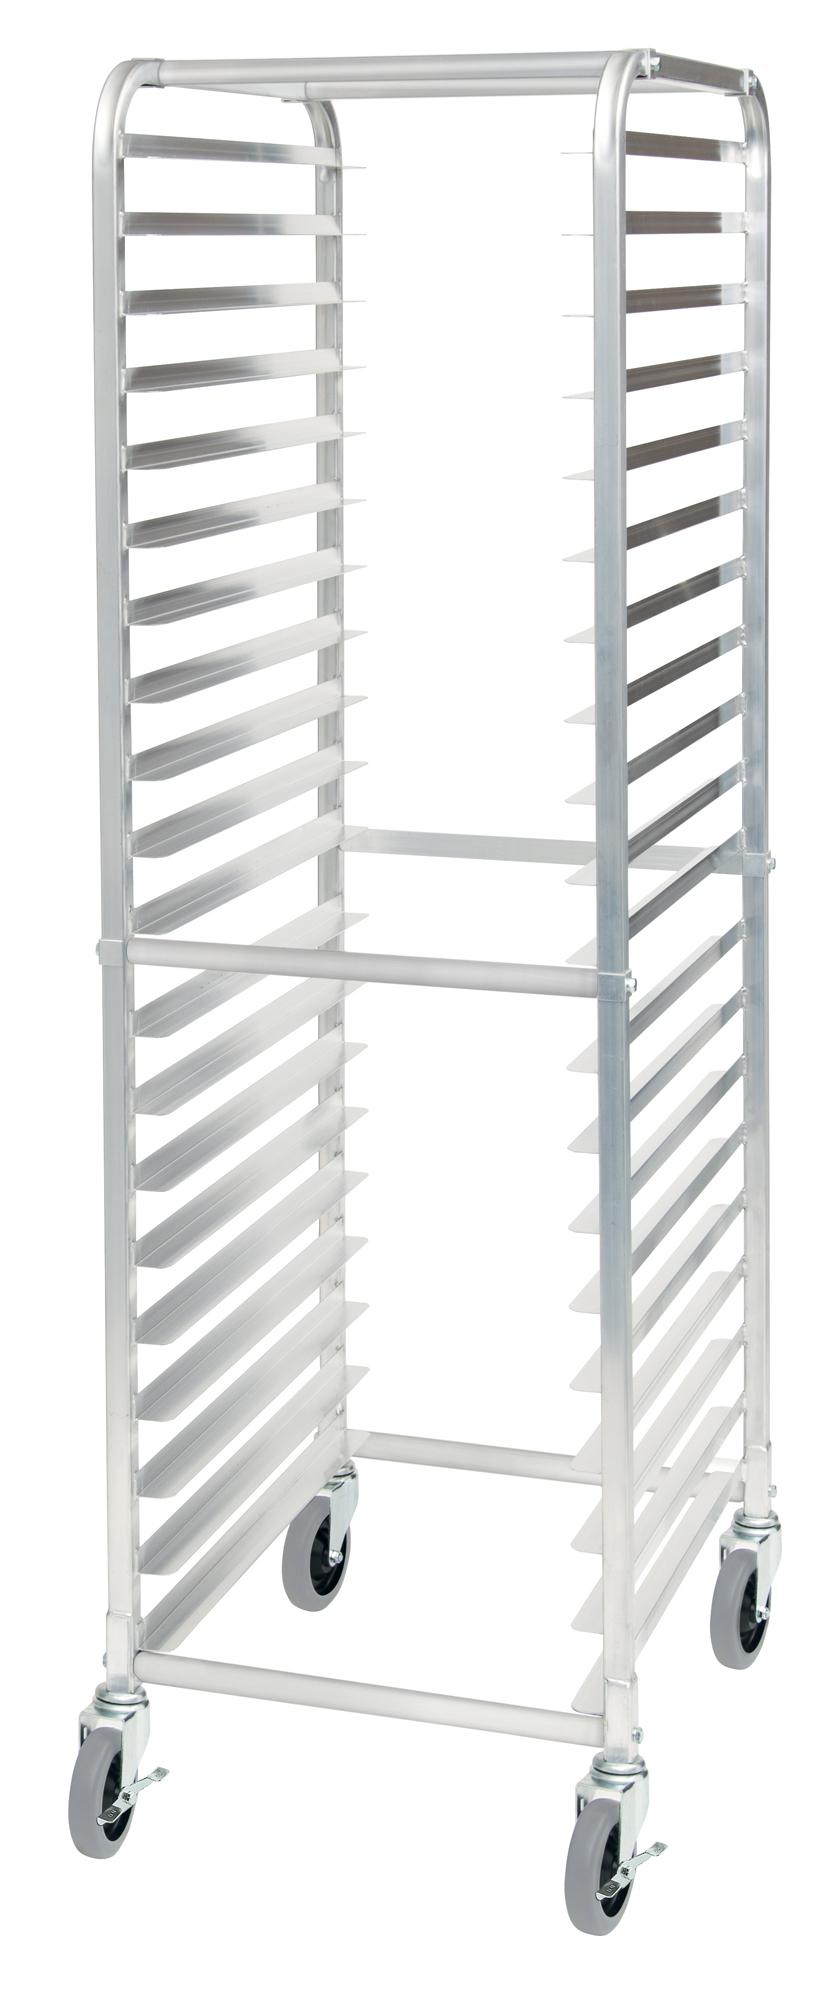 Winco ALRK-20R sheet pan racks